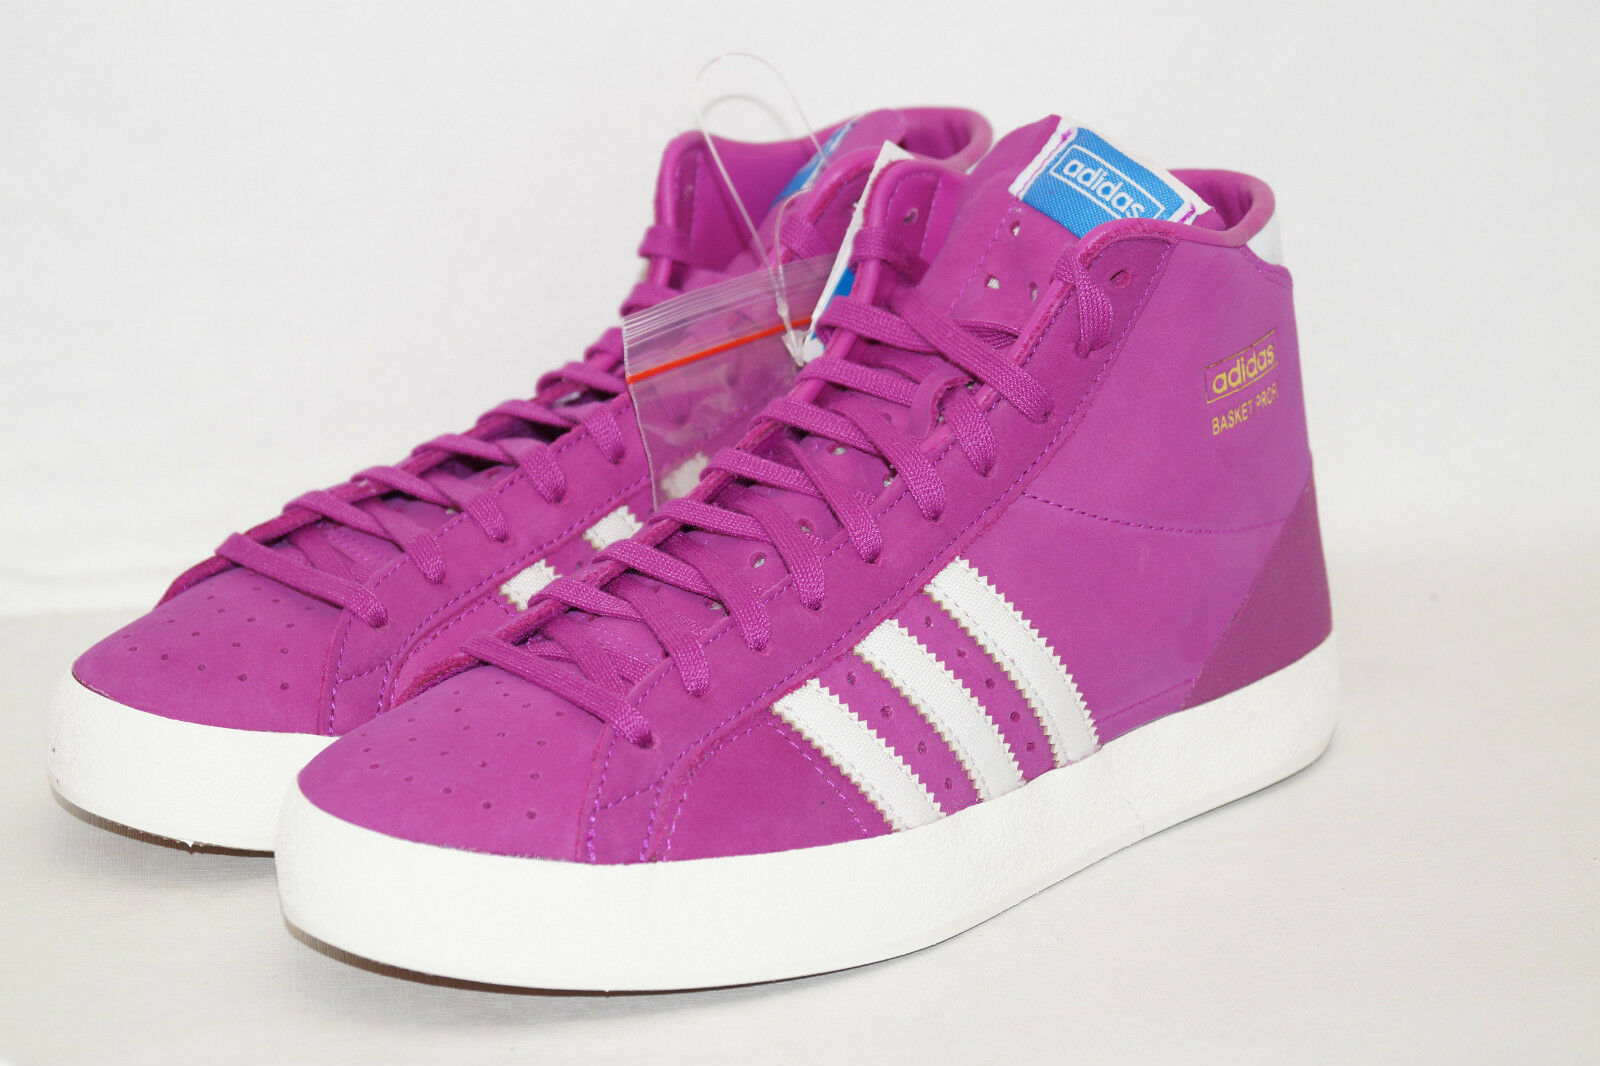 Adidas Originals Basket W Femmes Baskets taille 39 1 3 uk6 rose Chaussures De Sport